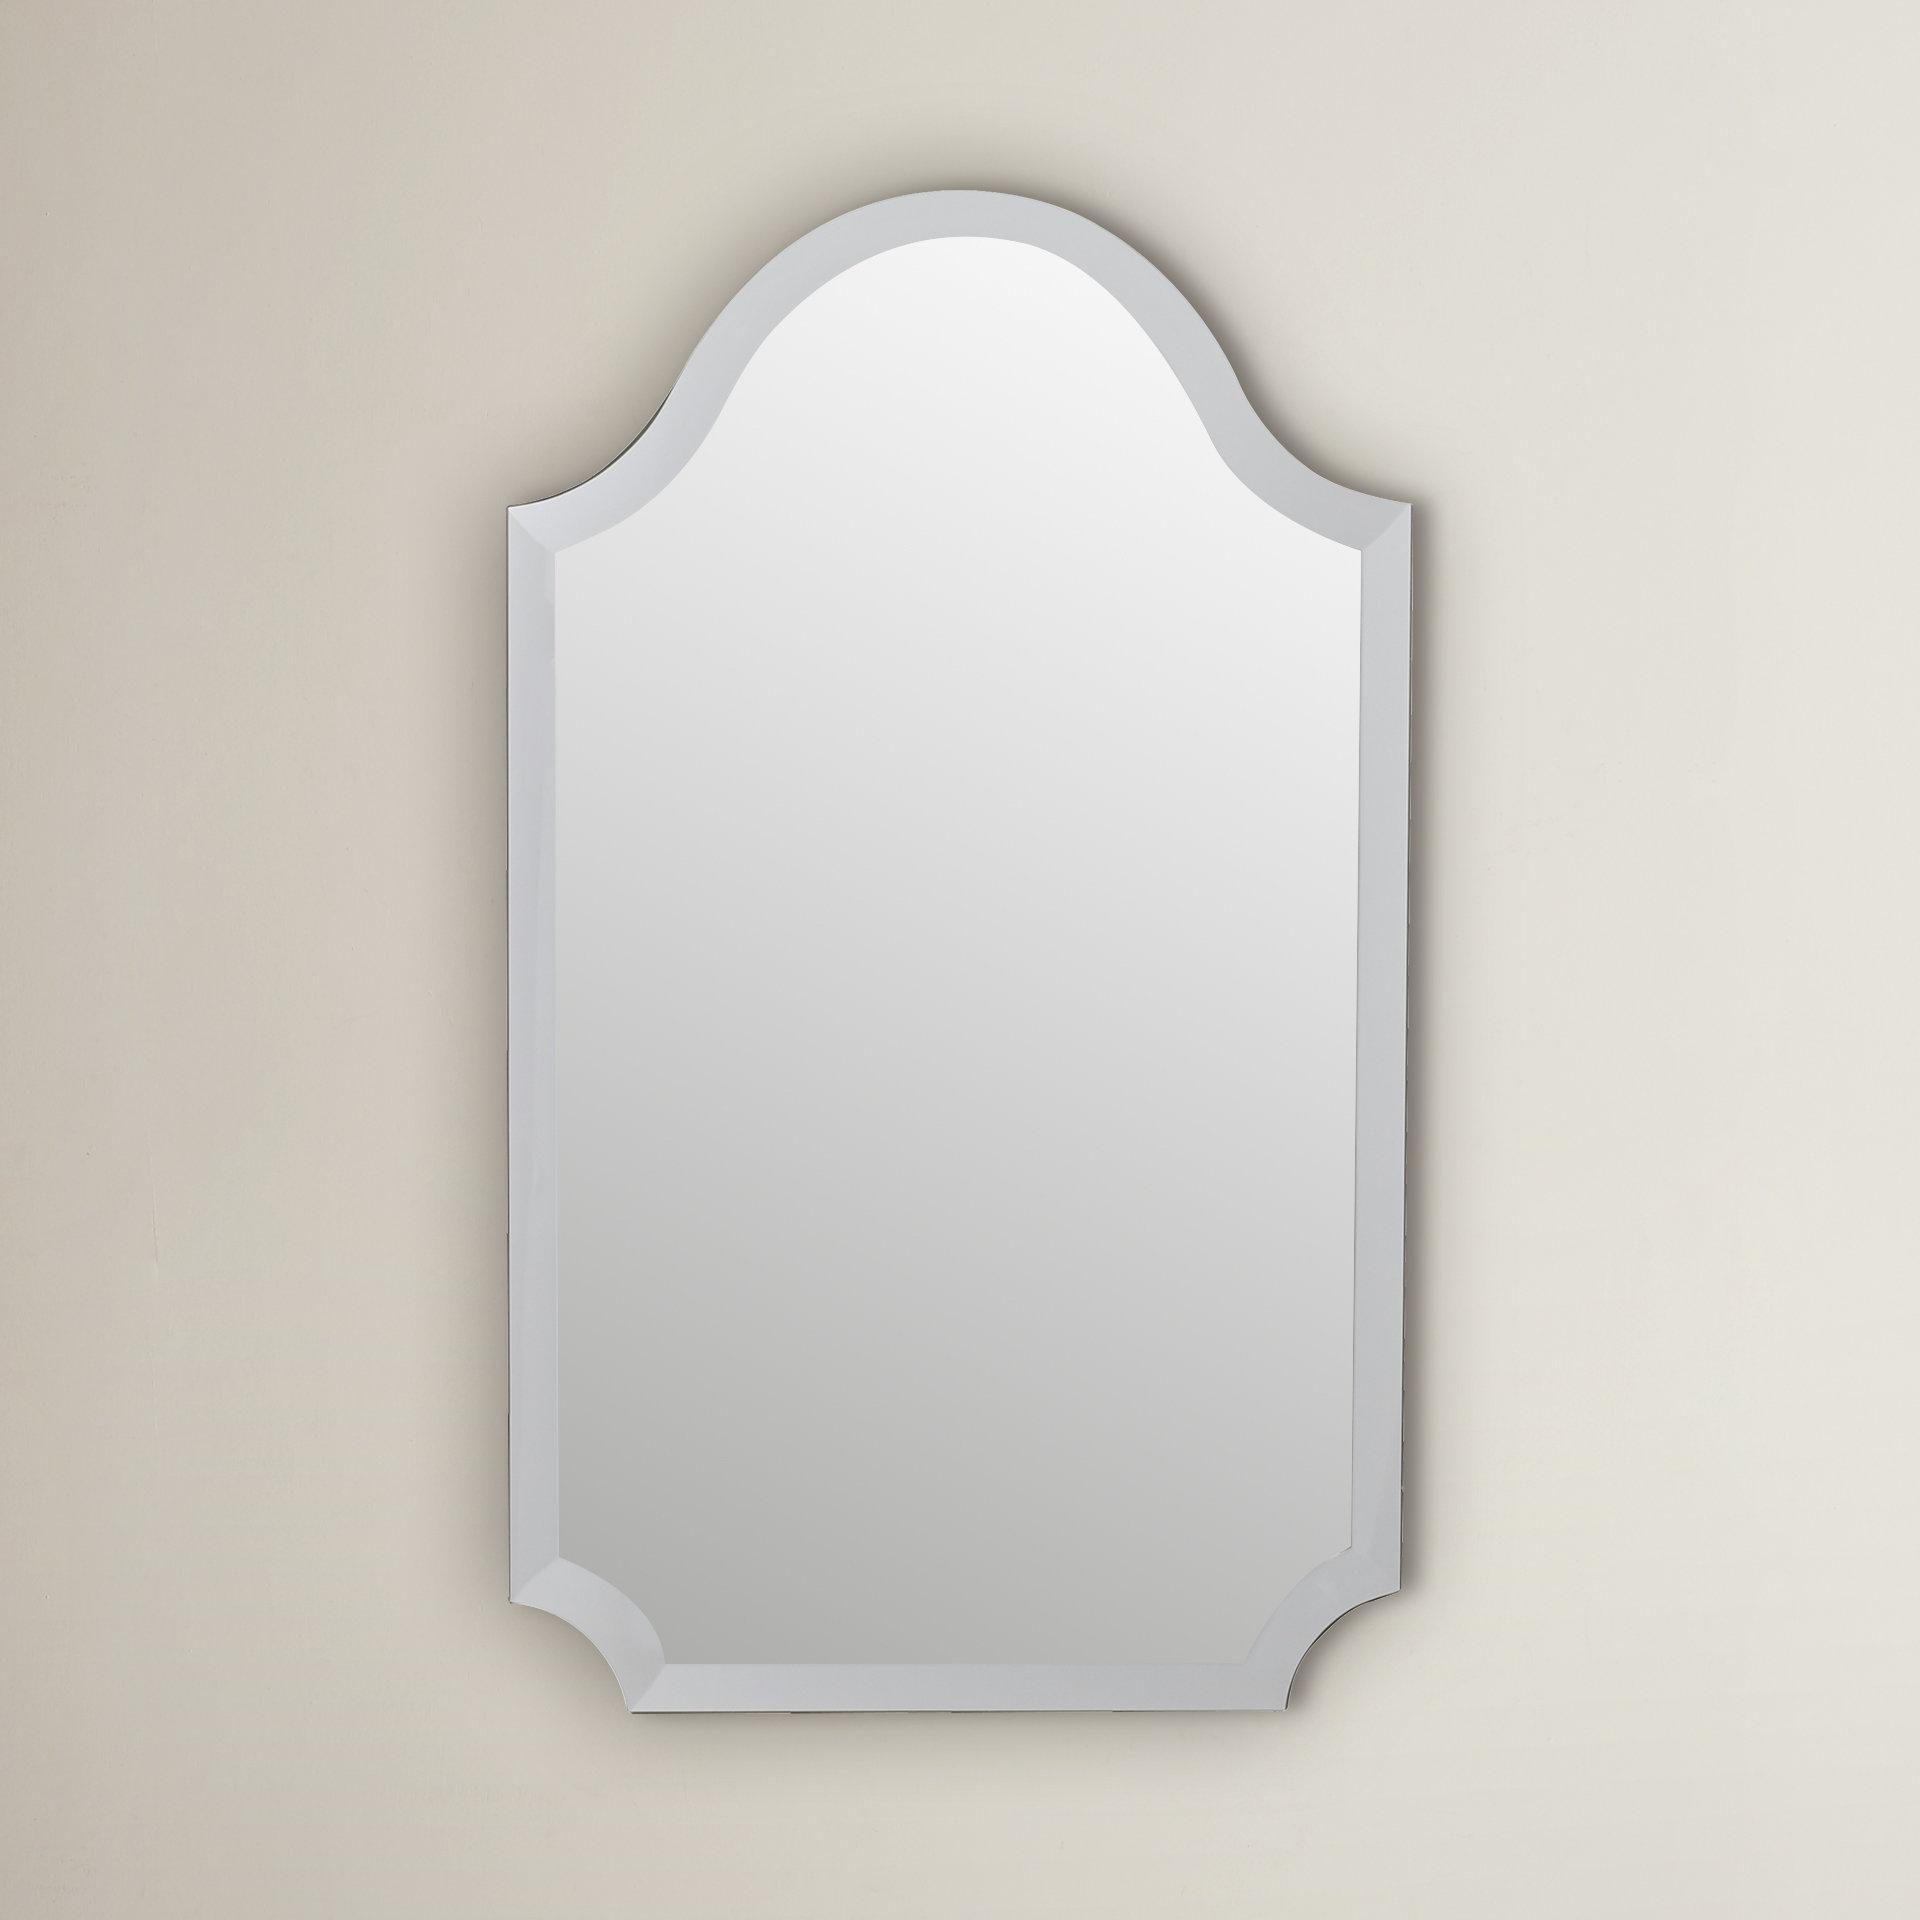 Willa Arlo Interiors Dariel Tall Arched Scalloped Wall Mirror Within Dariel Tall Arched Scalloped Wall Mirrors (View 2 of 20)